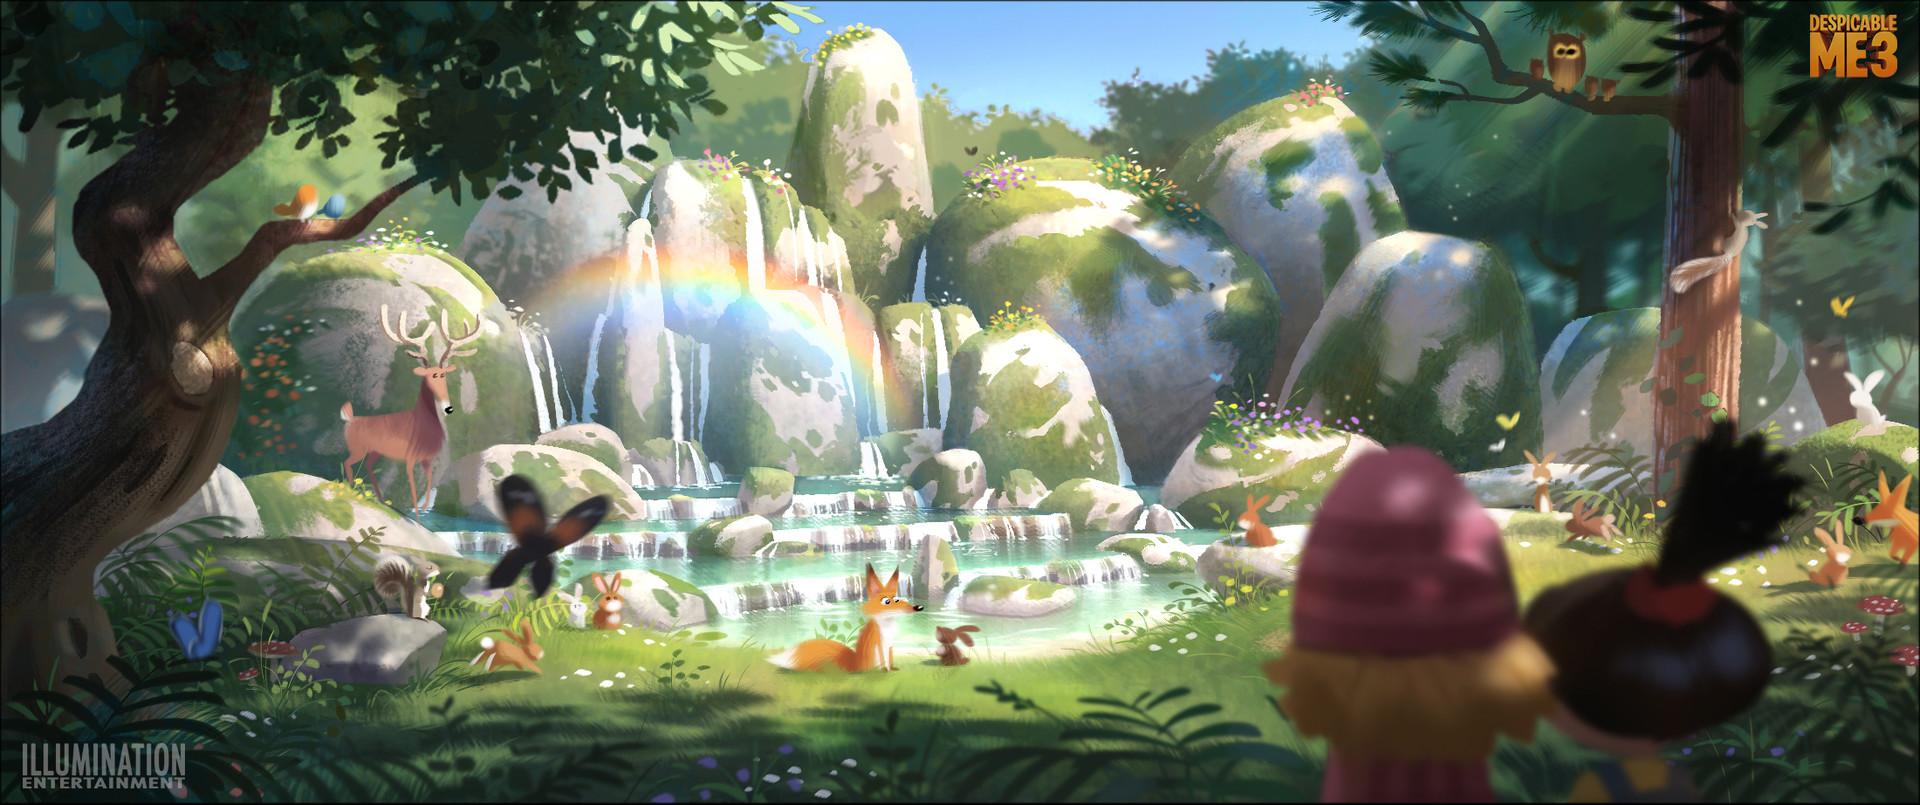 Ludo gavillet unicorn forest lg